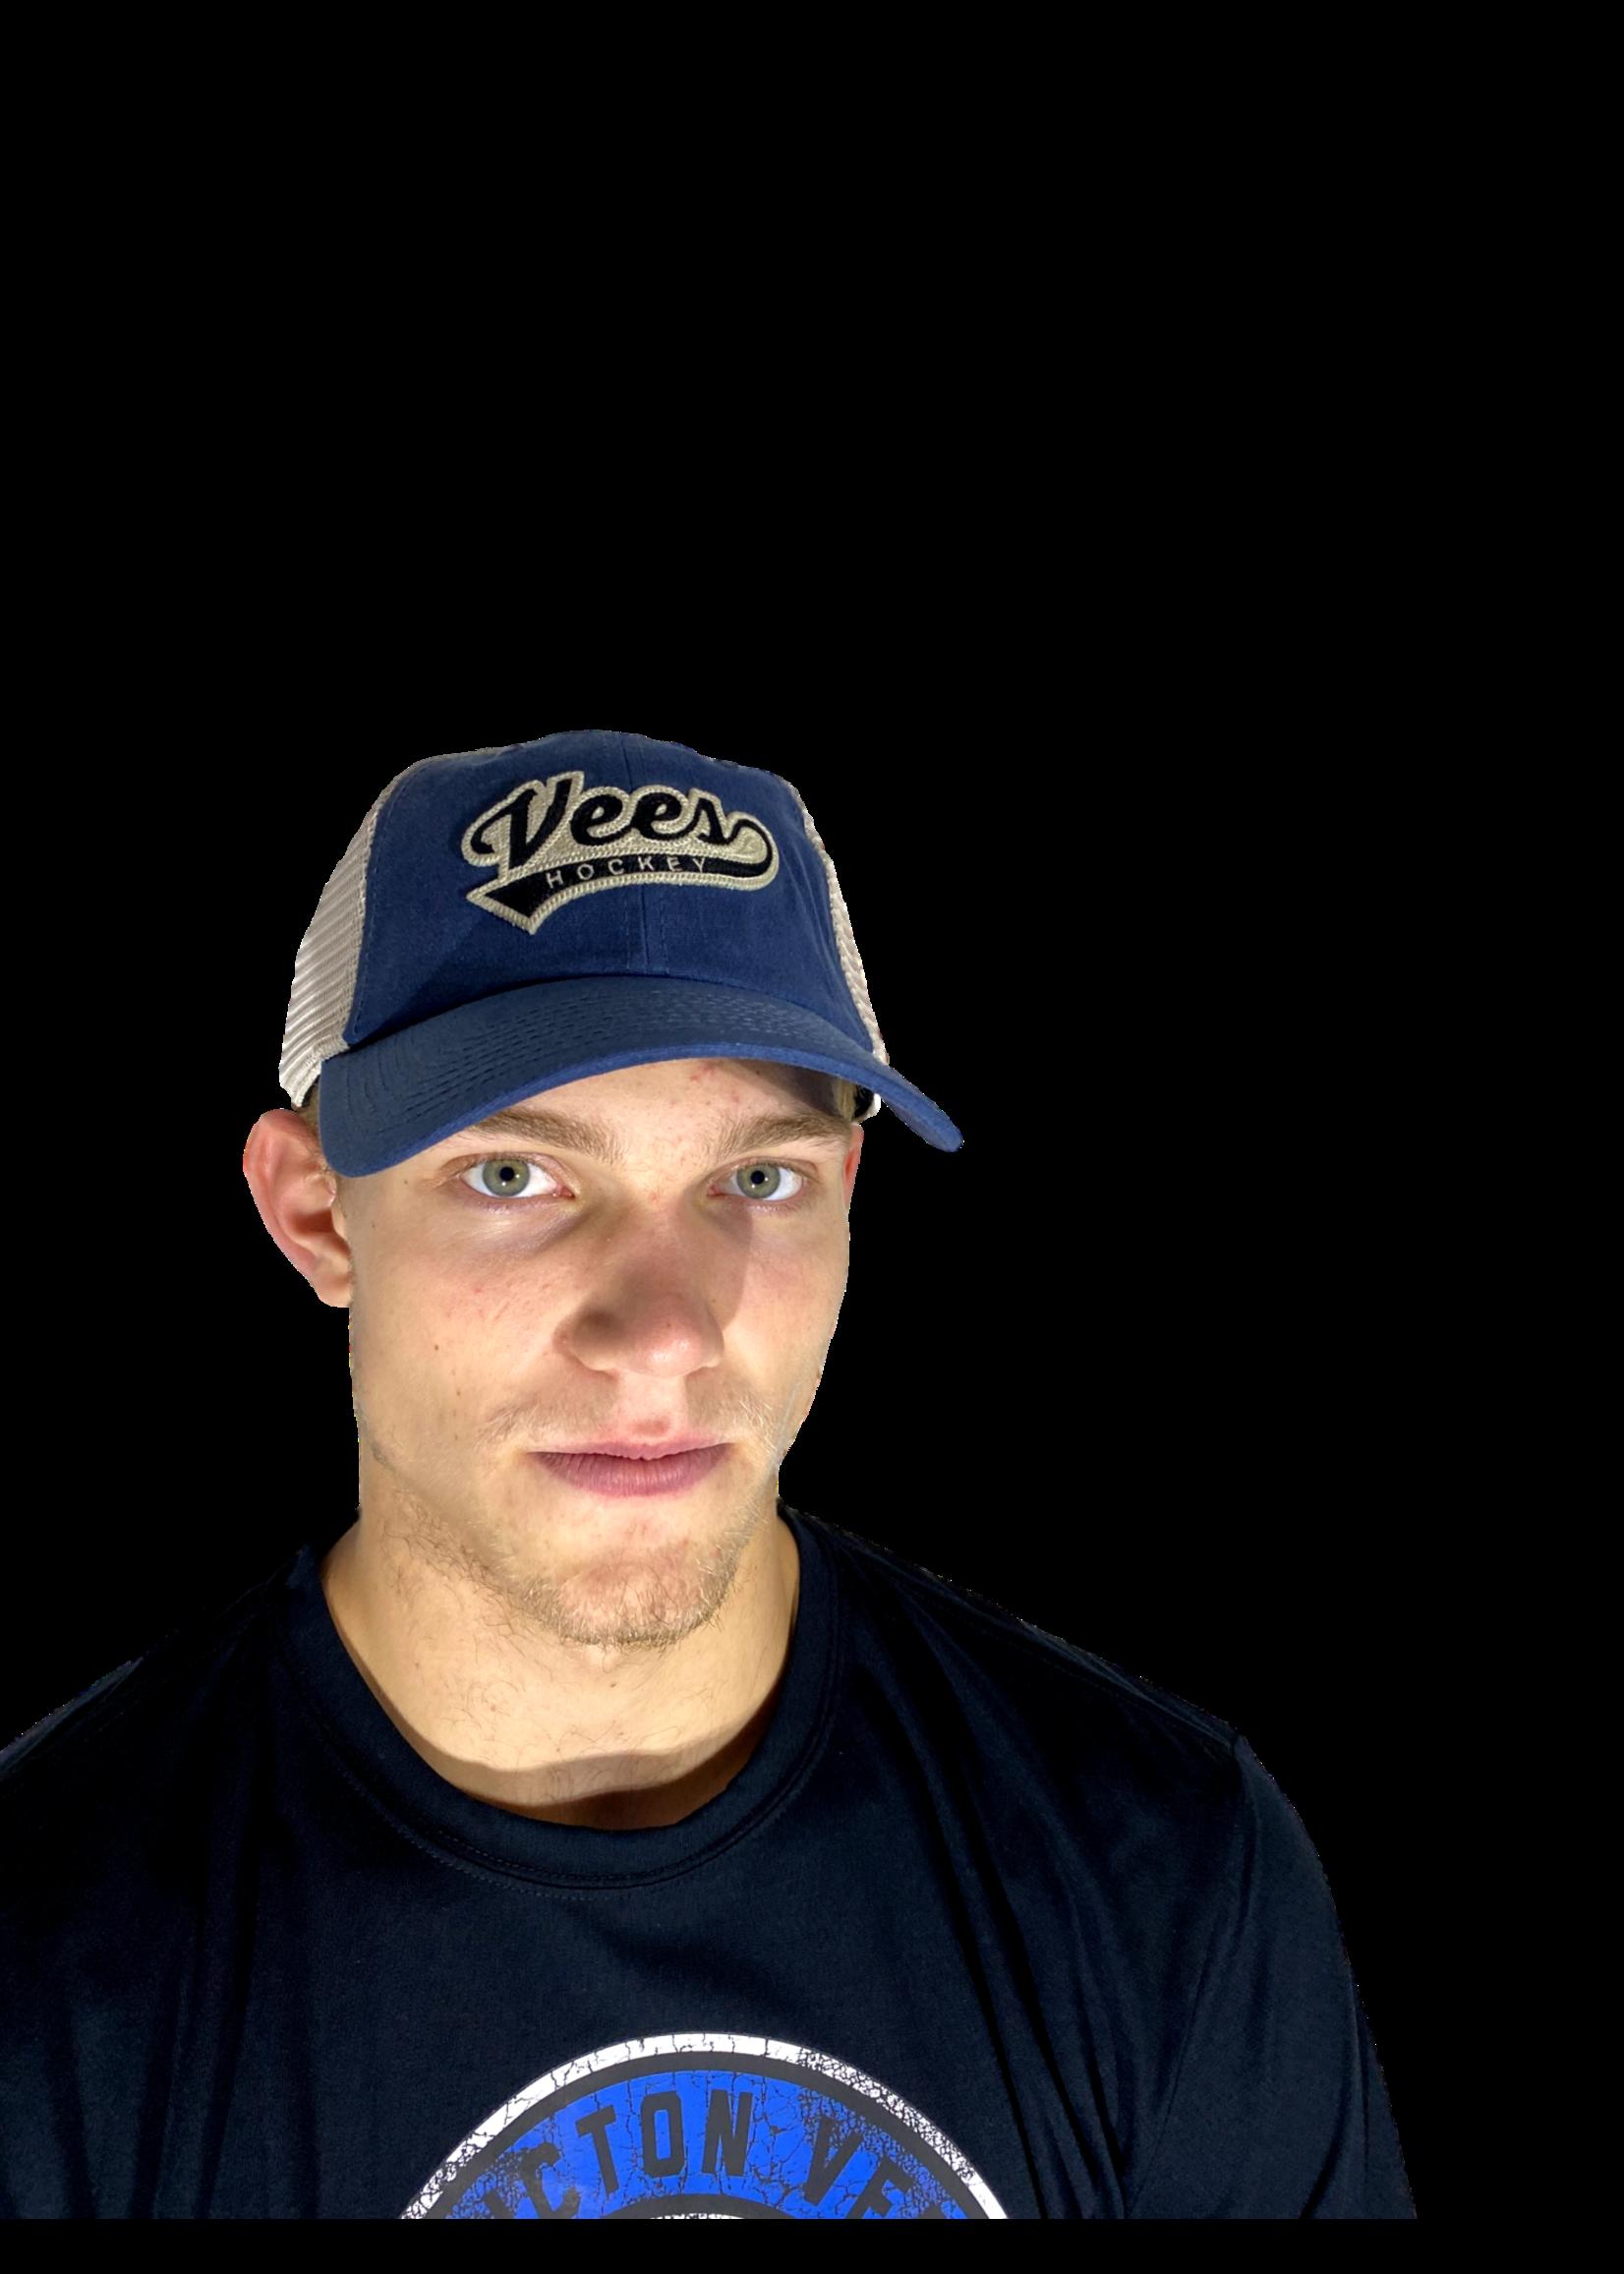 American Needle Penticton Vees Ball Hat-Waxed Bones